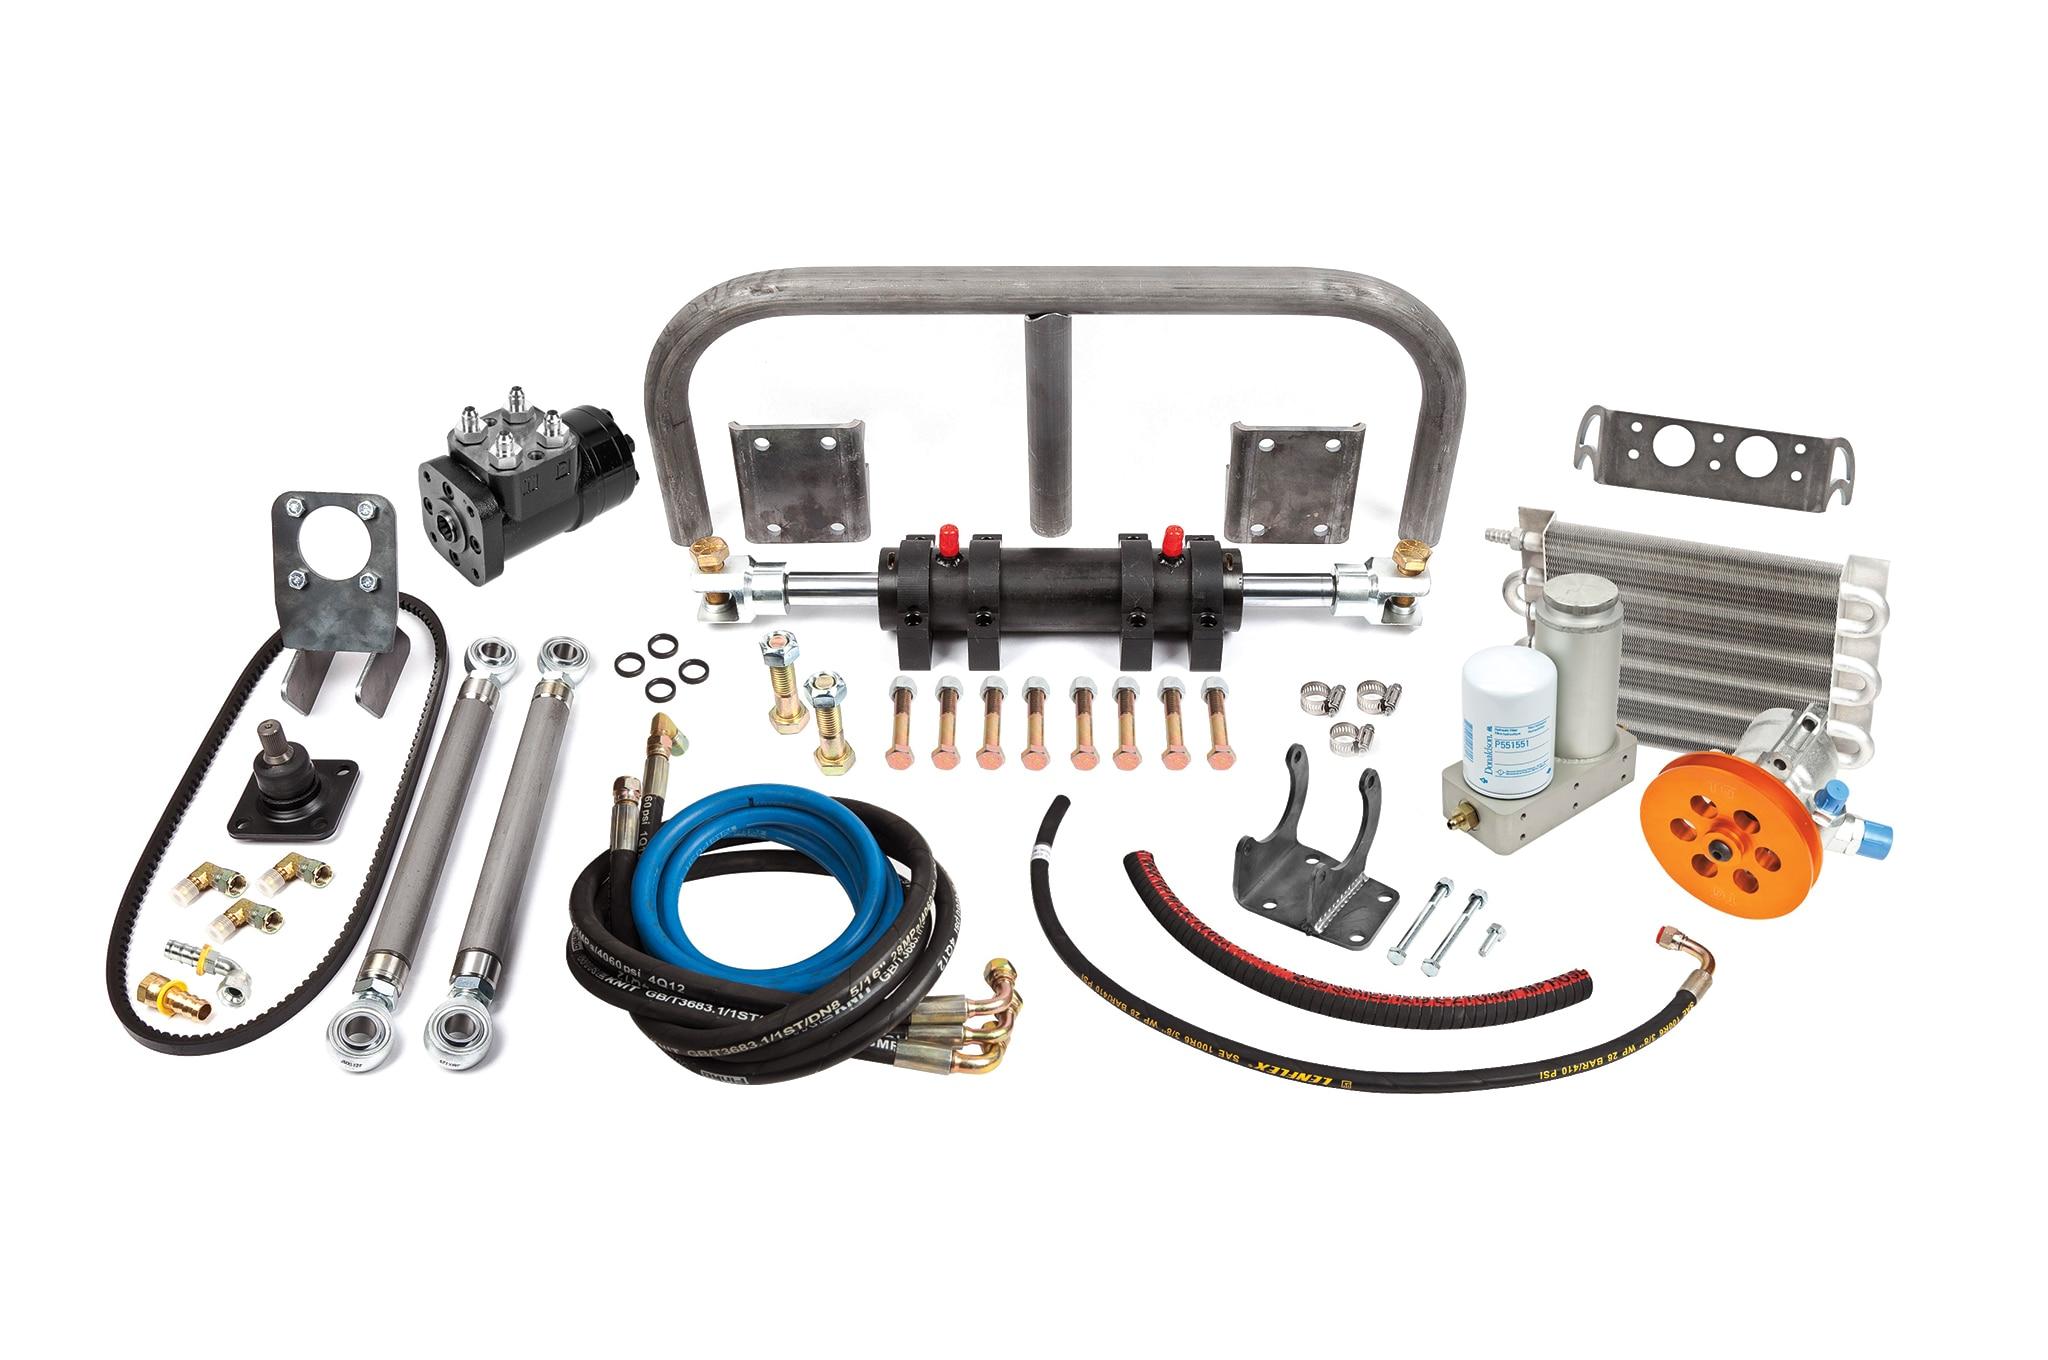 Trail Gears full hydraulic steering kit